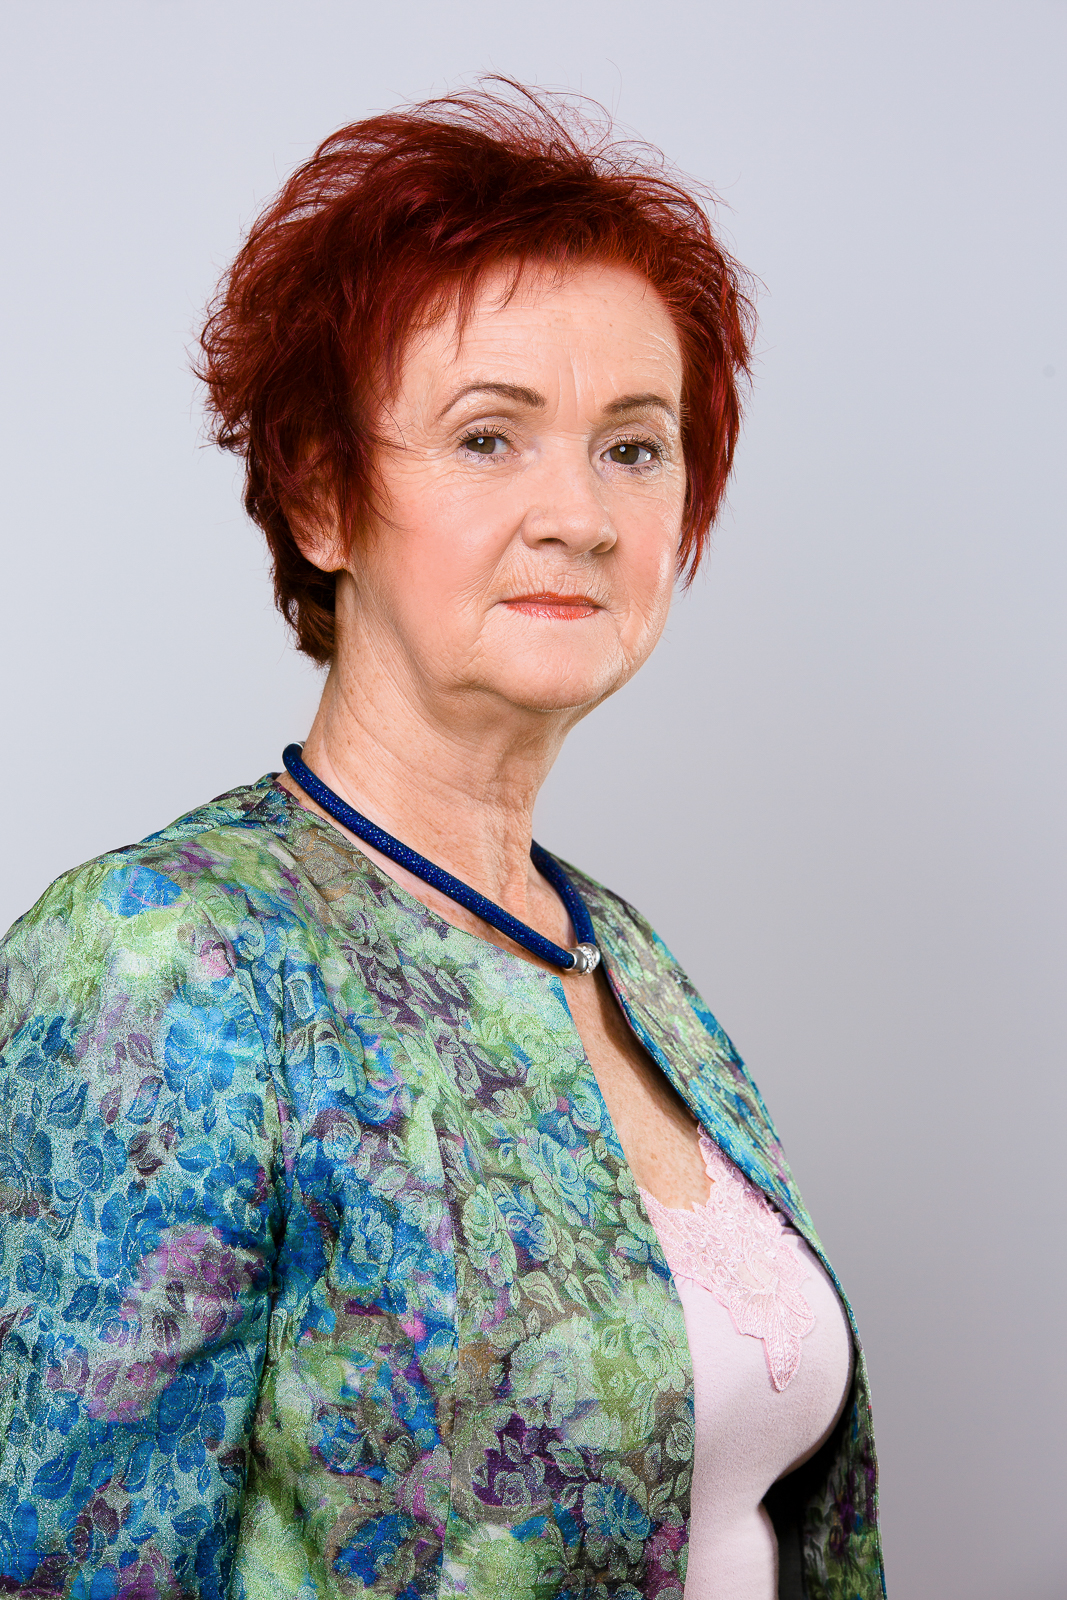 Maria Stachowska